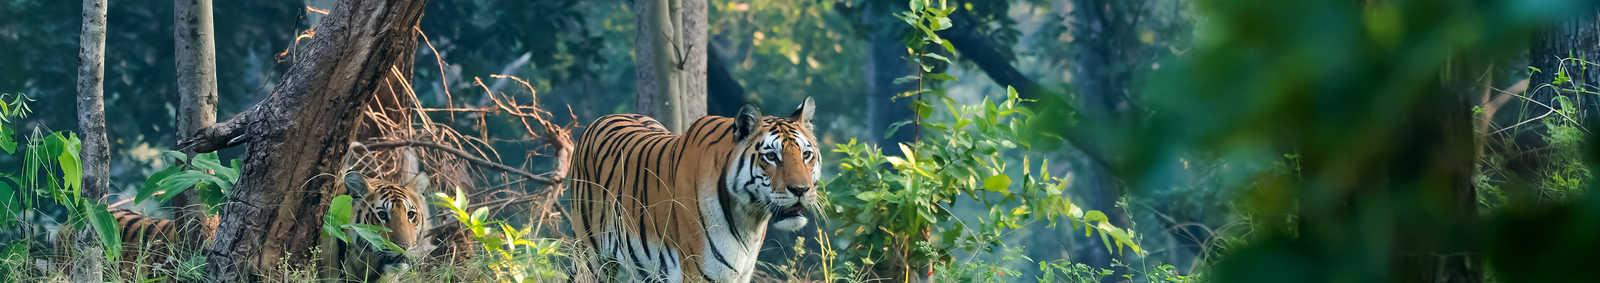 Tiger Pench National Park